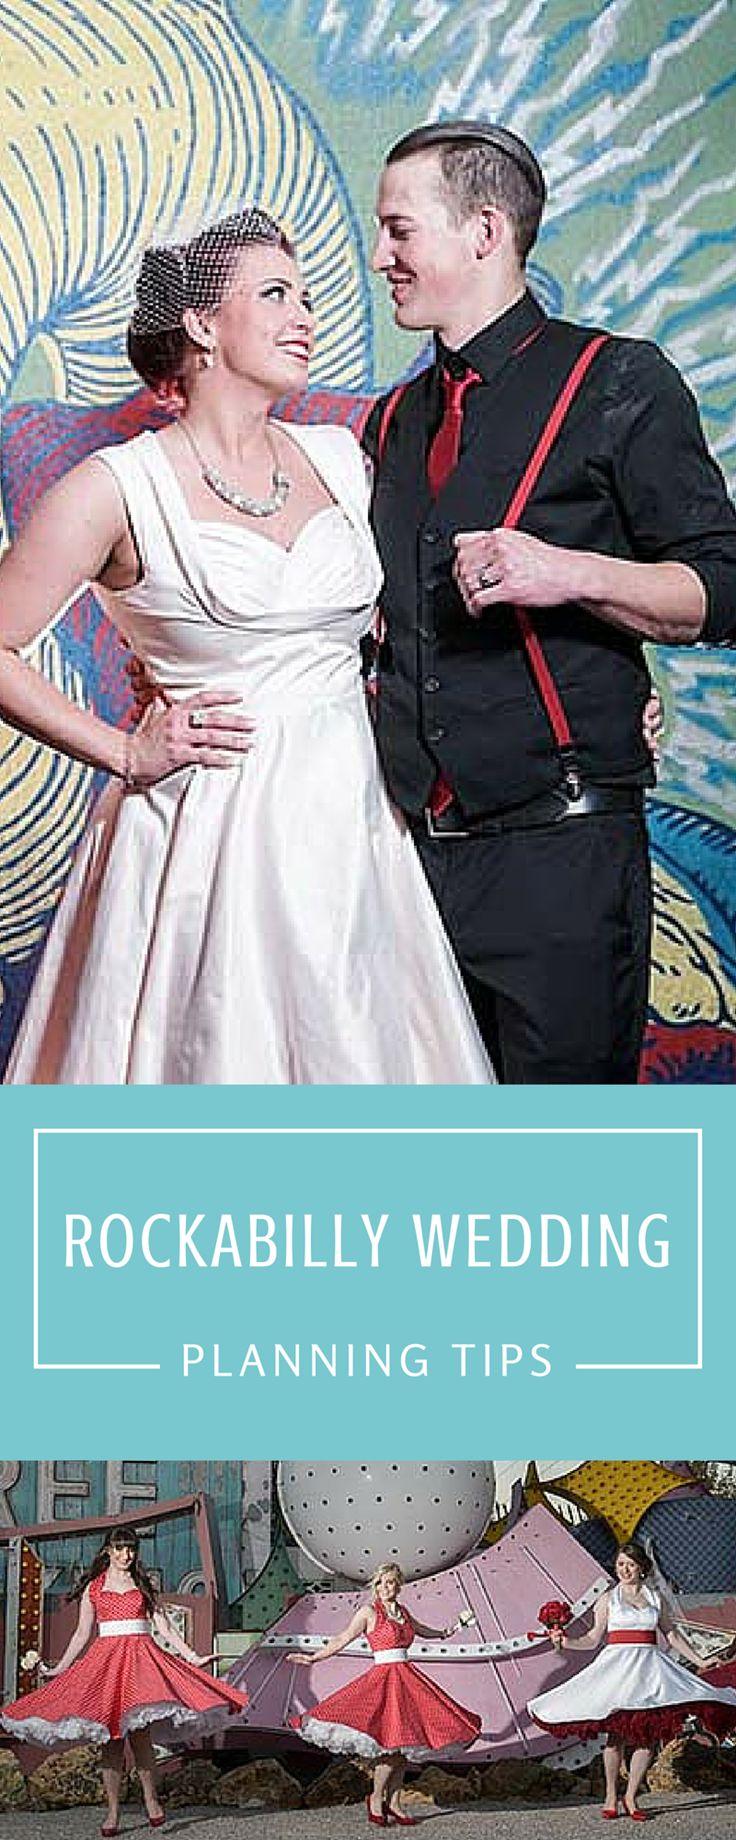 Viva Las Vegas! Rockabilly Wedding Planning Tips for a fun retro and vintage inspired wedding.